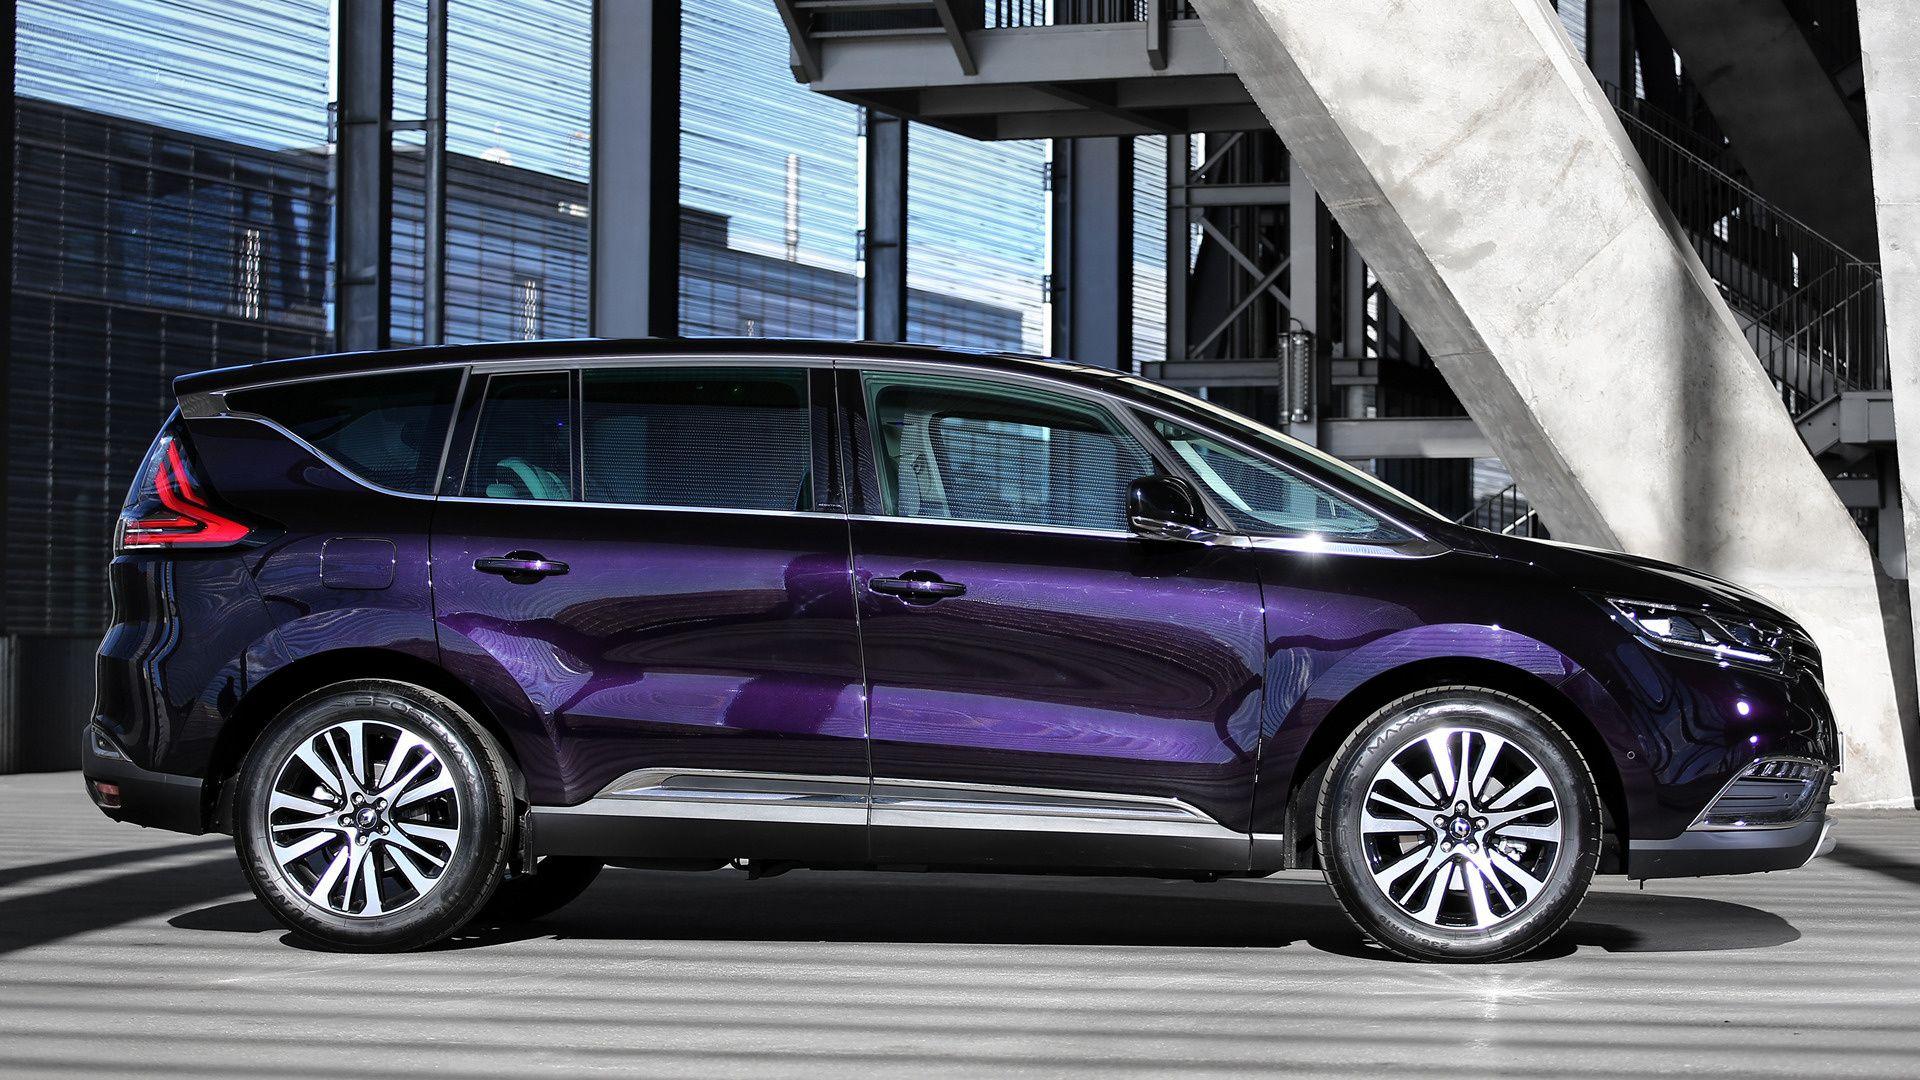 2015 Renault Espace Initiale Paris Wallpapers And Hd Car